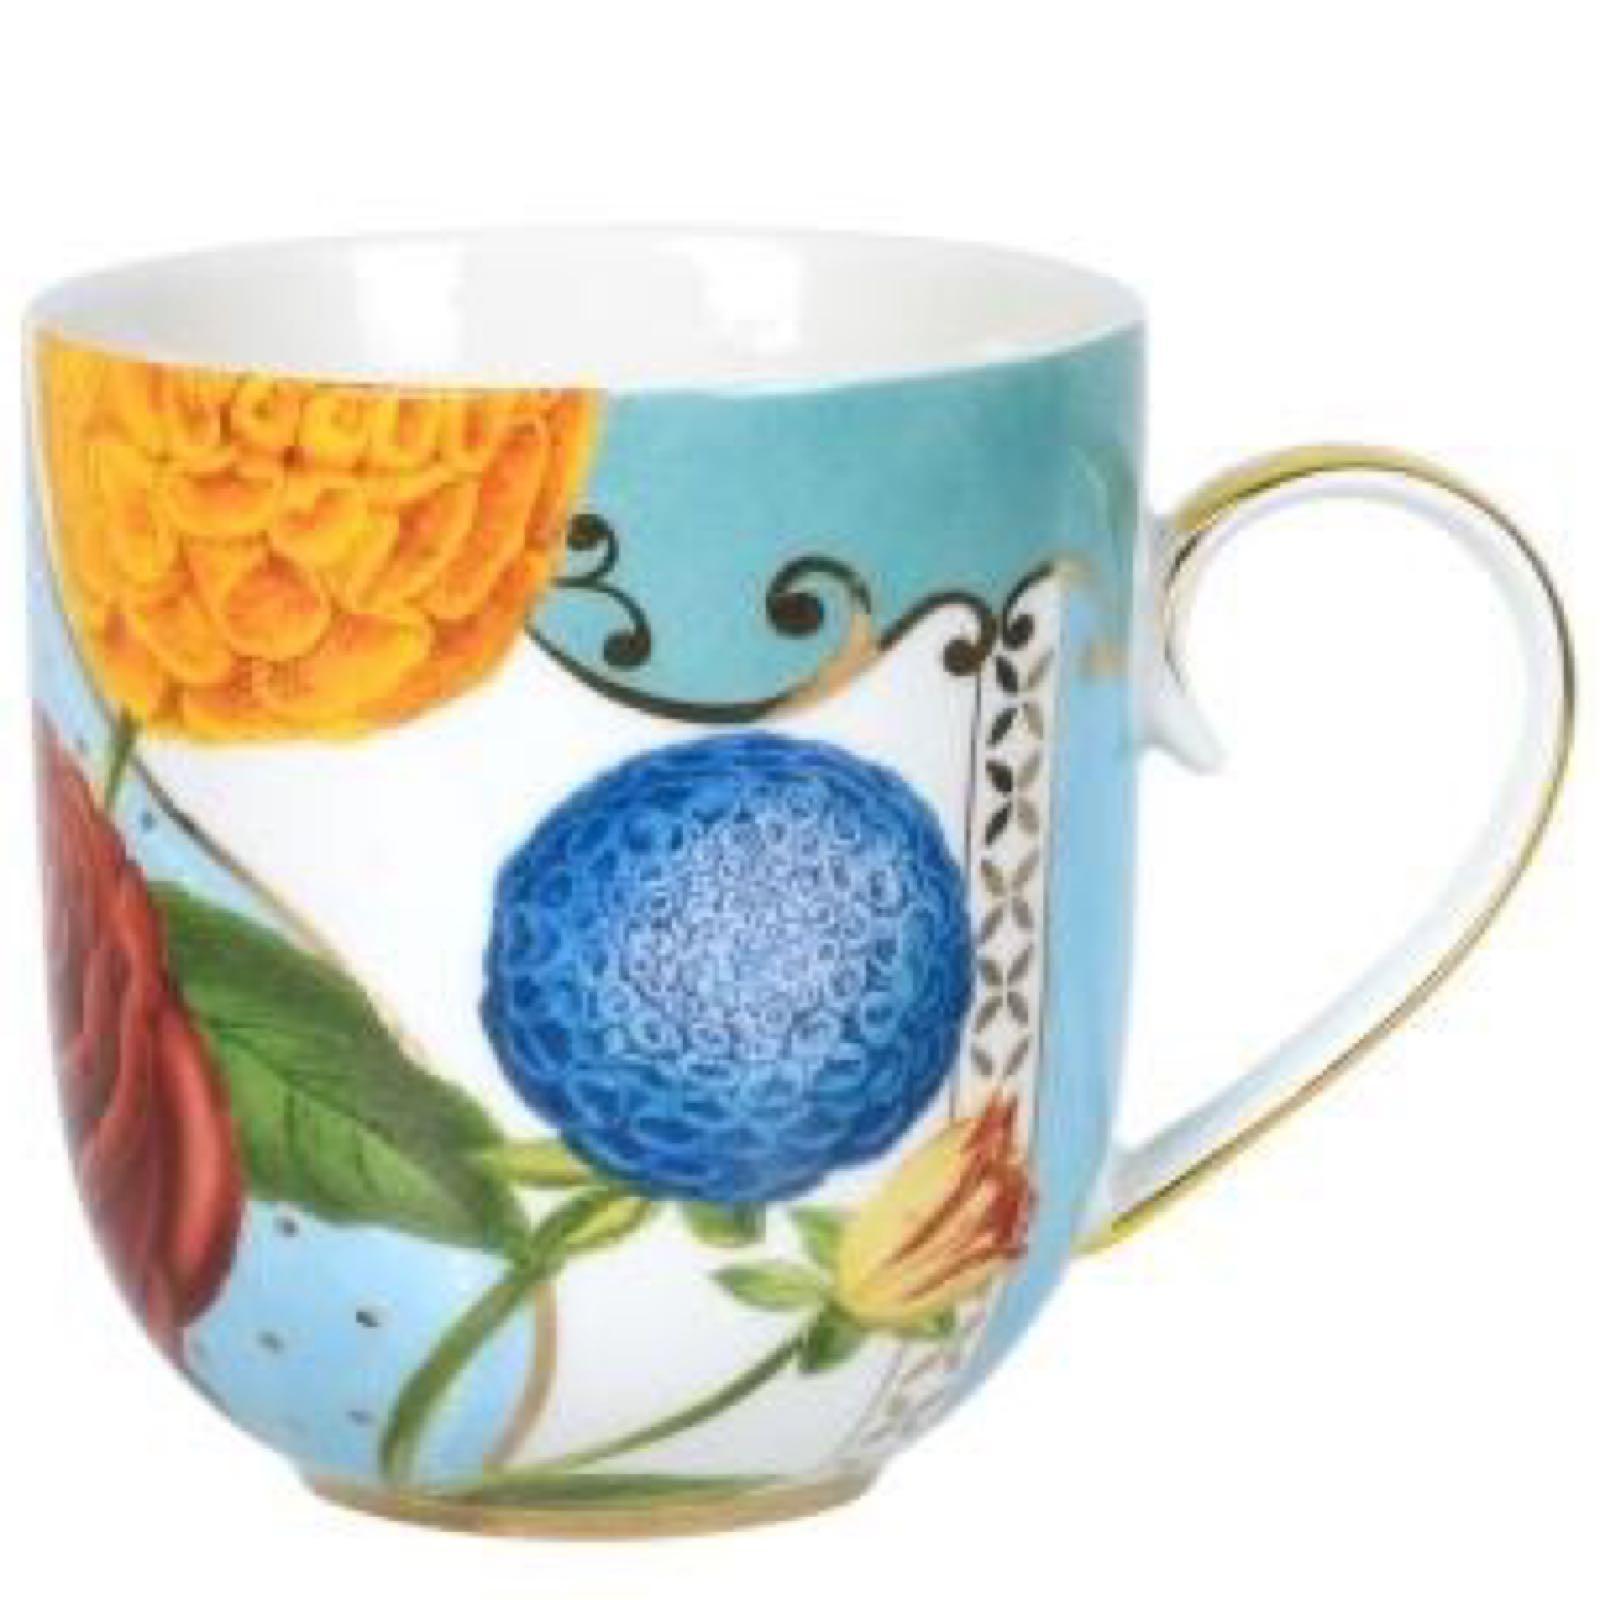 Pip studio large royal flowers mug